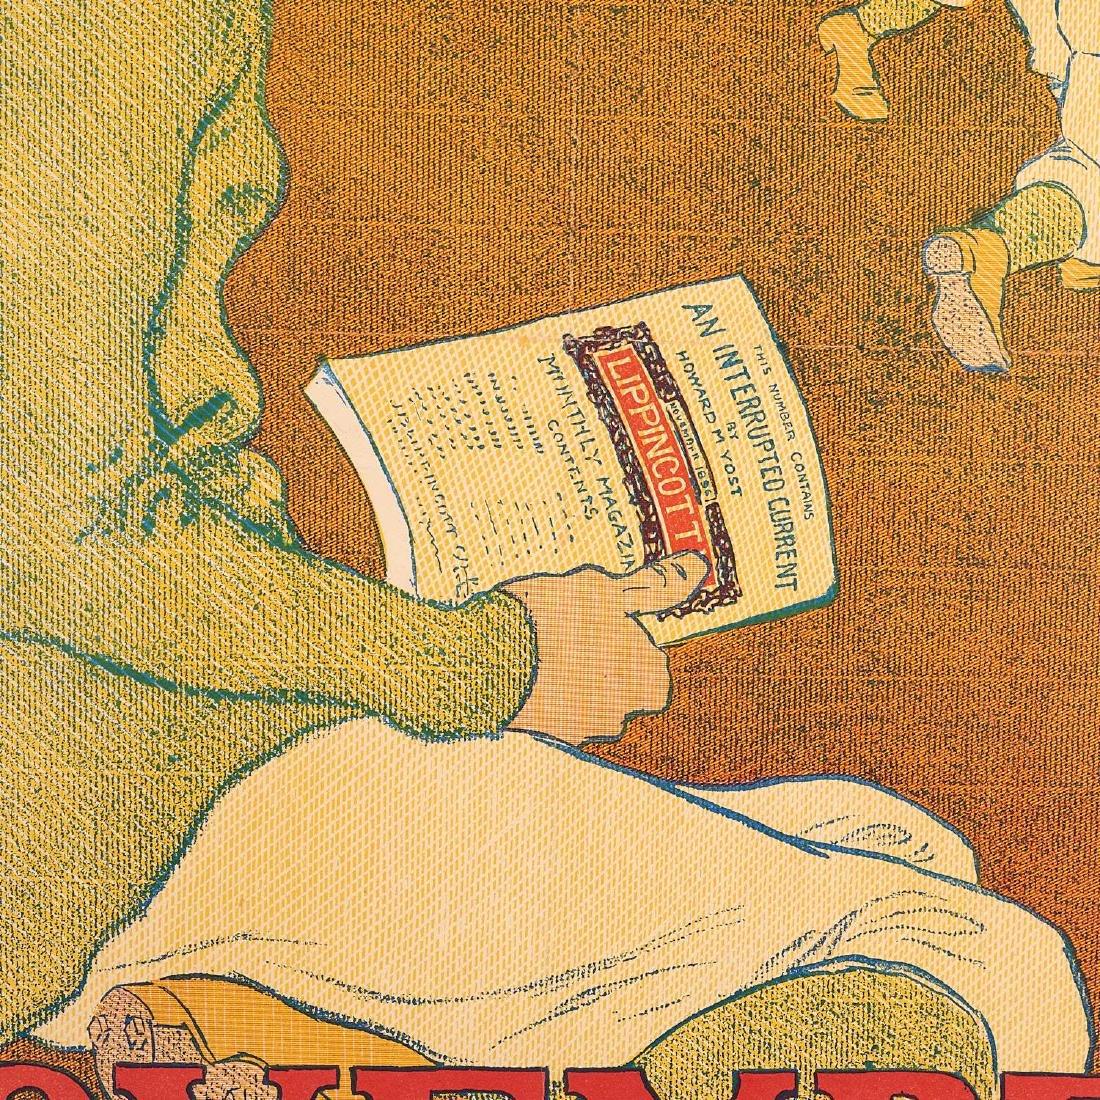 J. J. Gould Jr., poster - 3